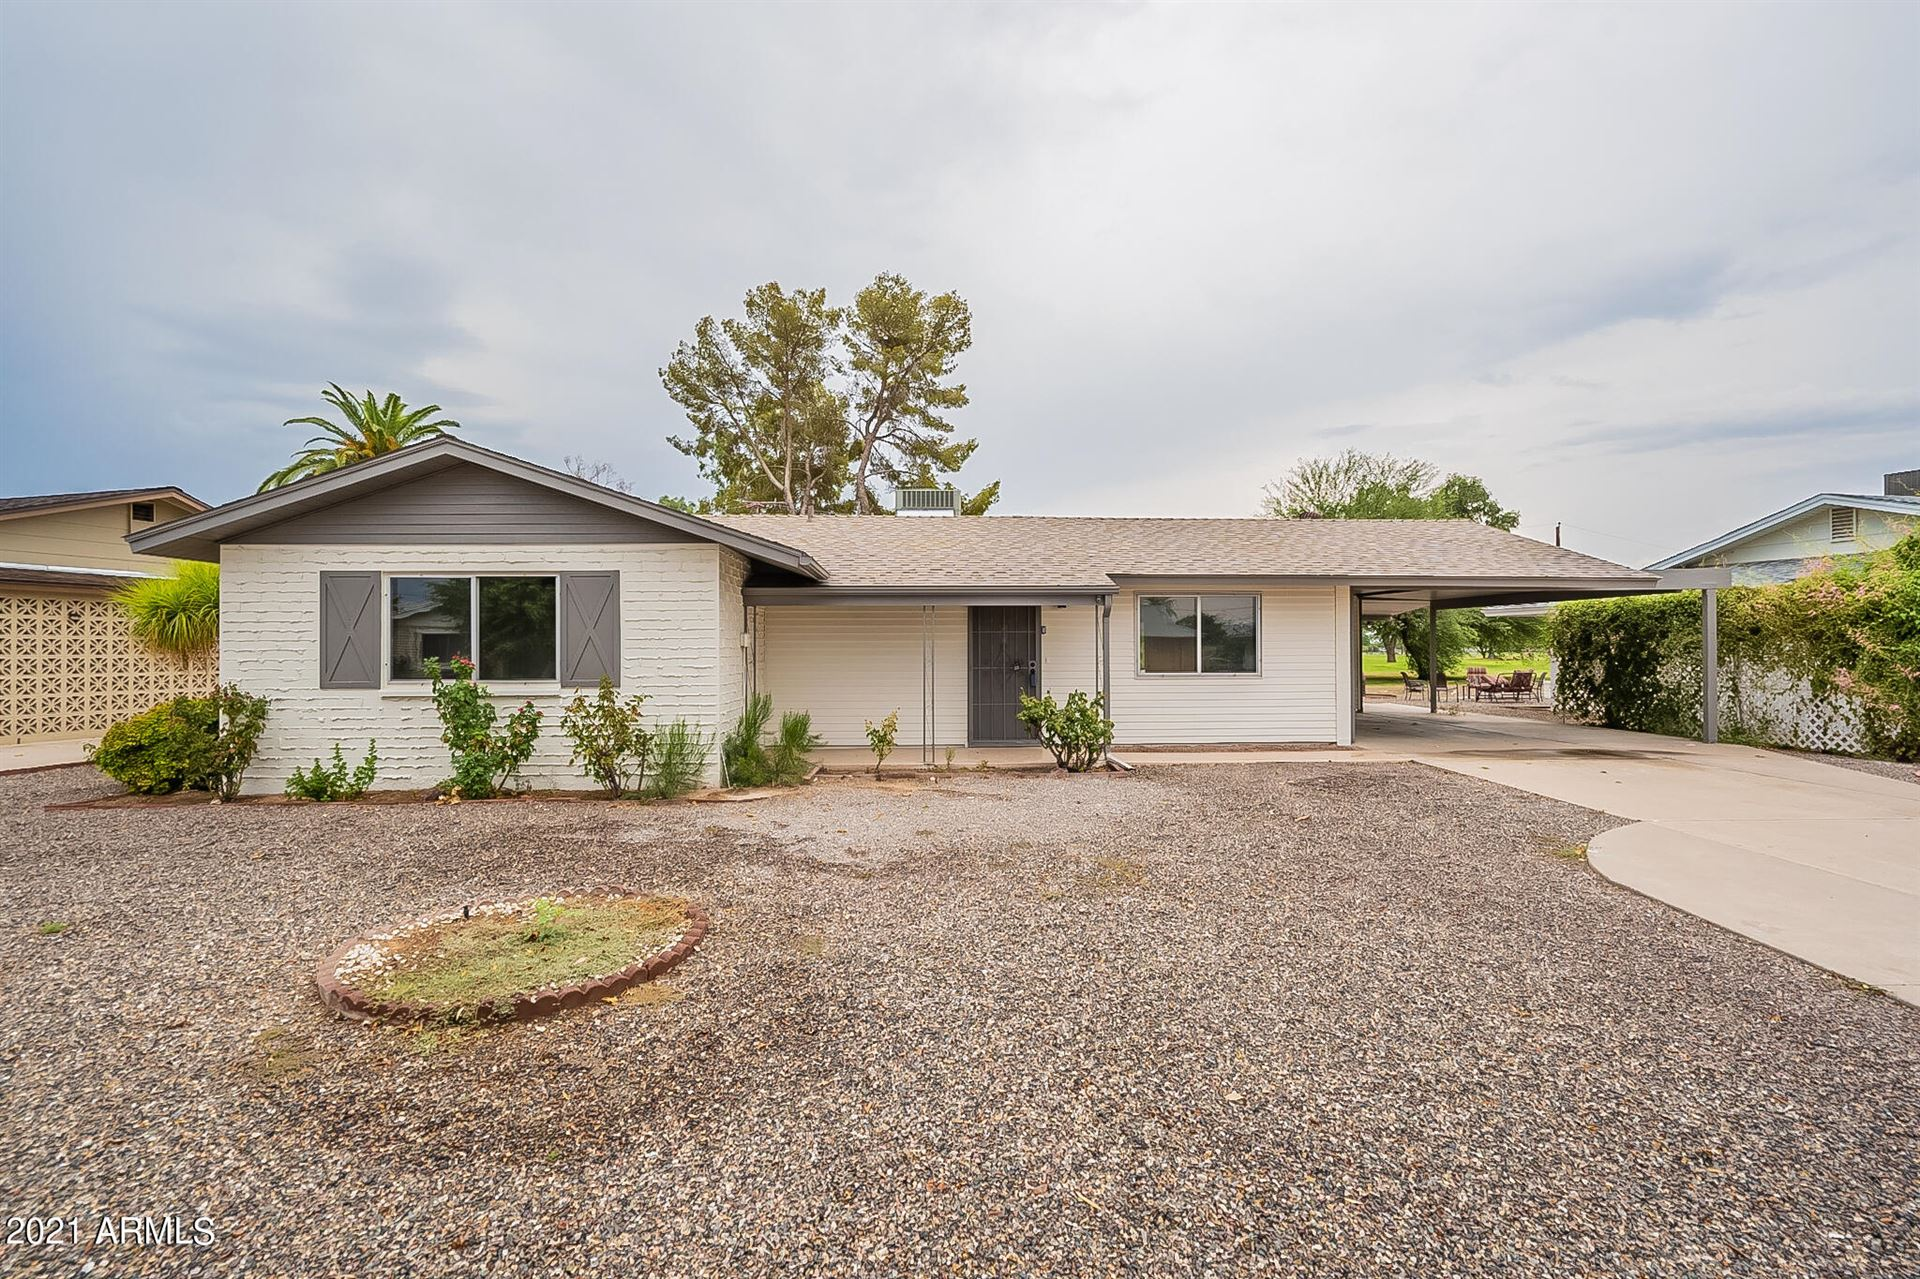 Photo of 10409 W SNEAD Drive, Sun City, AZ 85351 (MLS # 6268942)